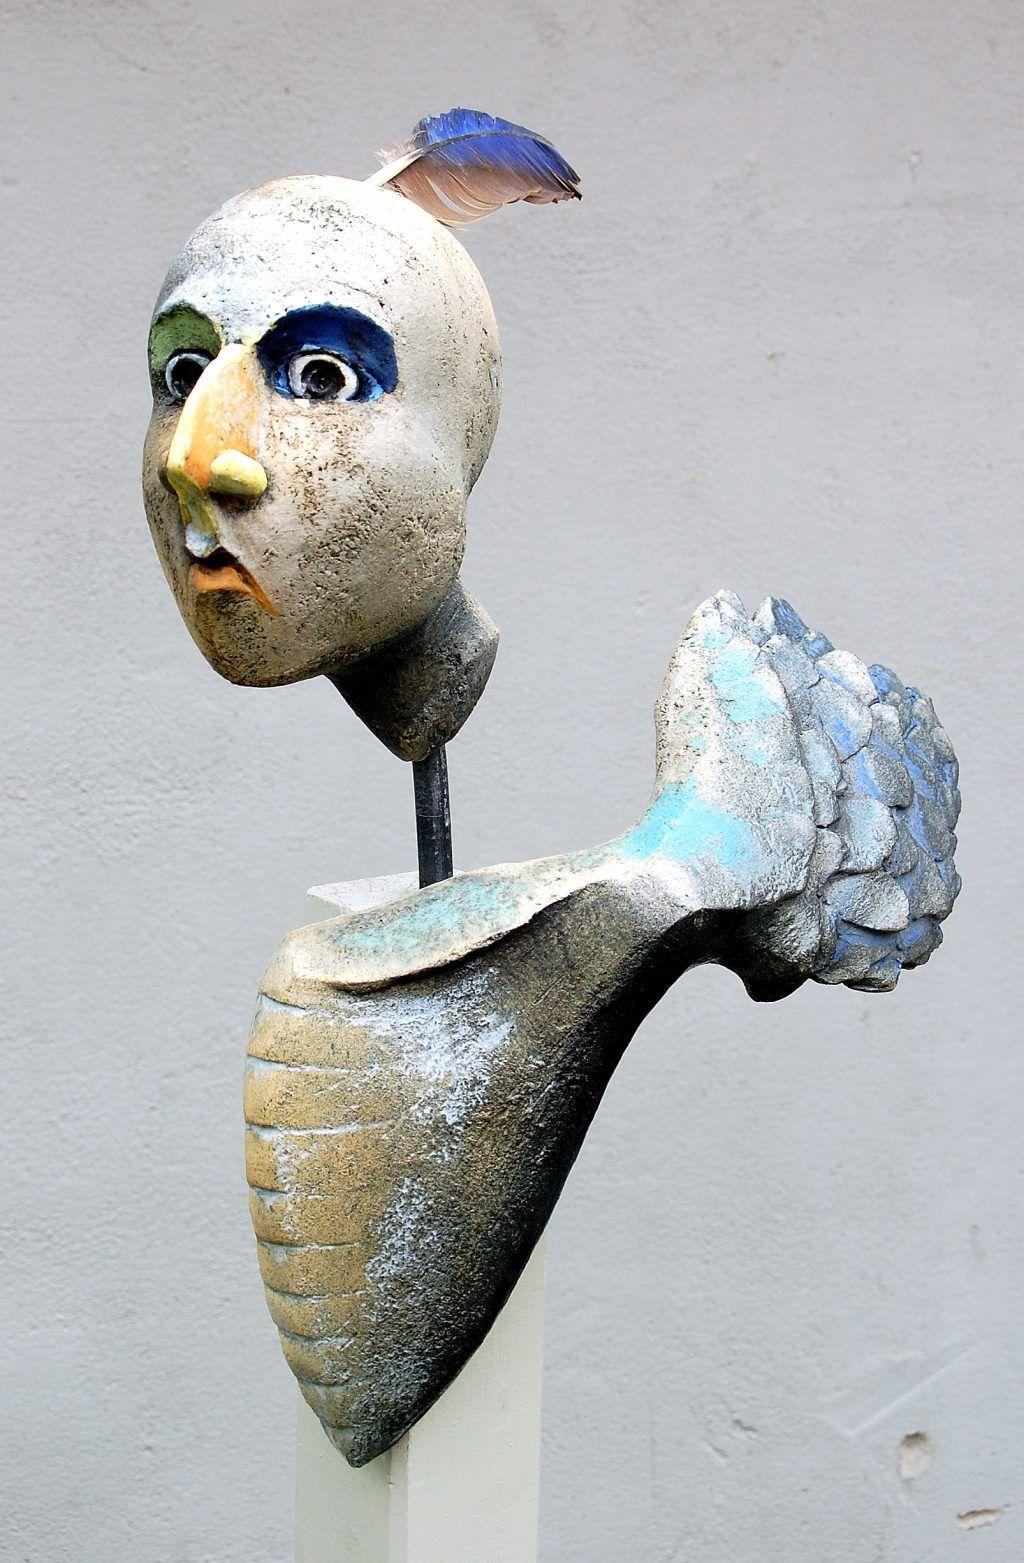 Blue - bird man - sculpture - fenix - Fagel Fenix III - Gitte Lind